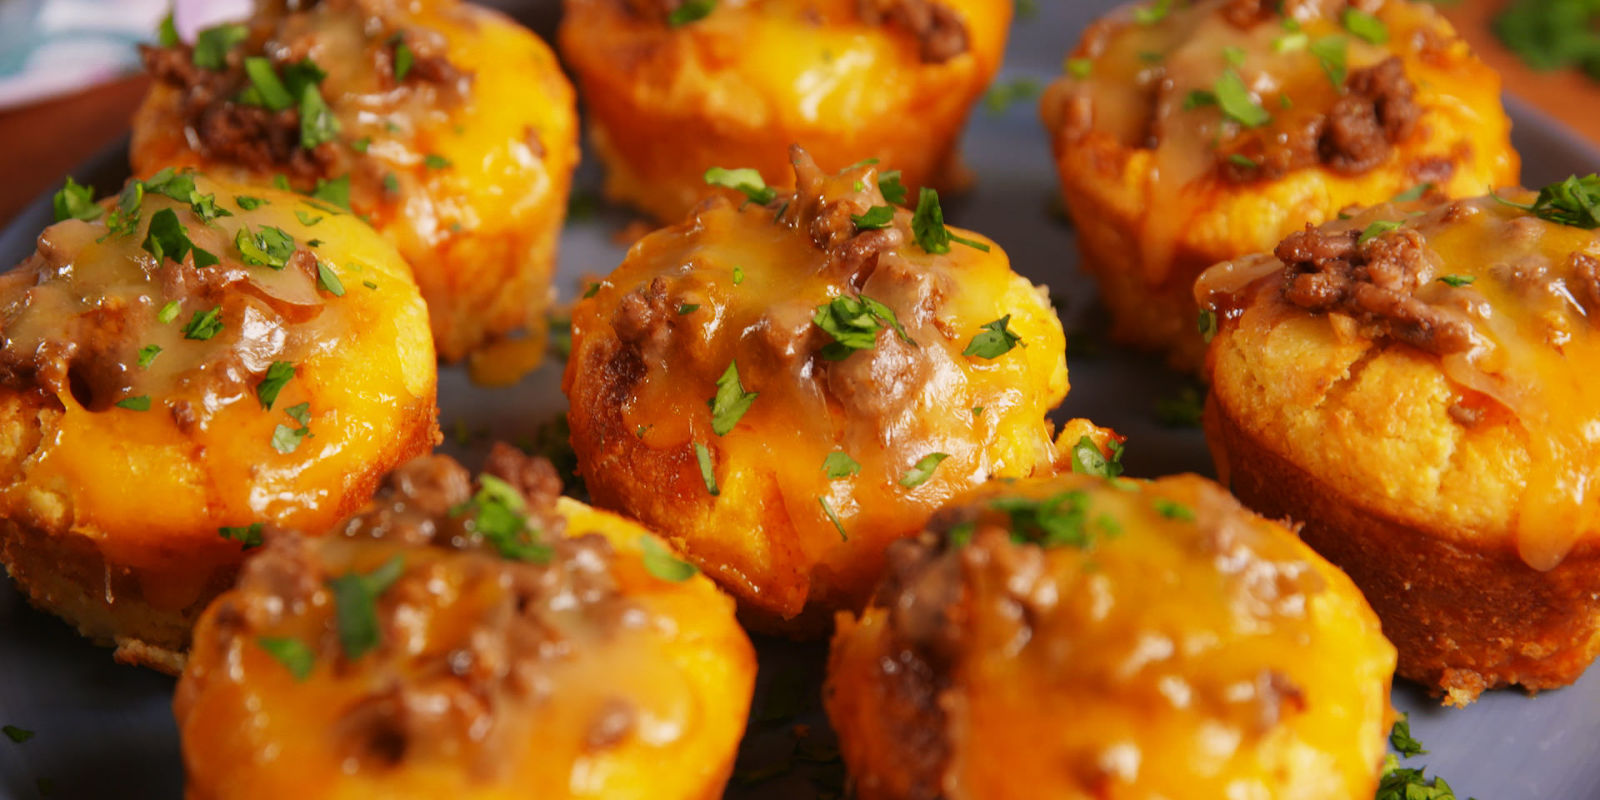 Best Mini Tamale Pies Recipe - How to Make Mini Tamale Pies